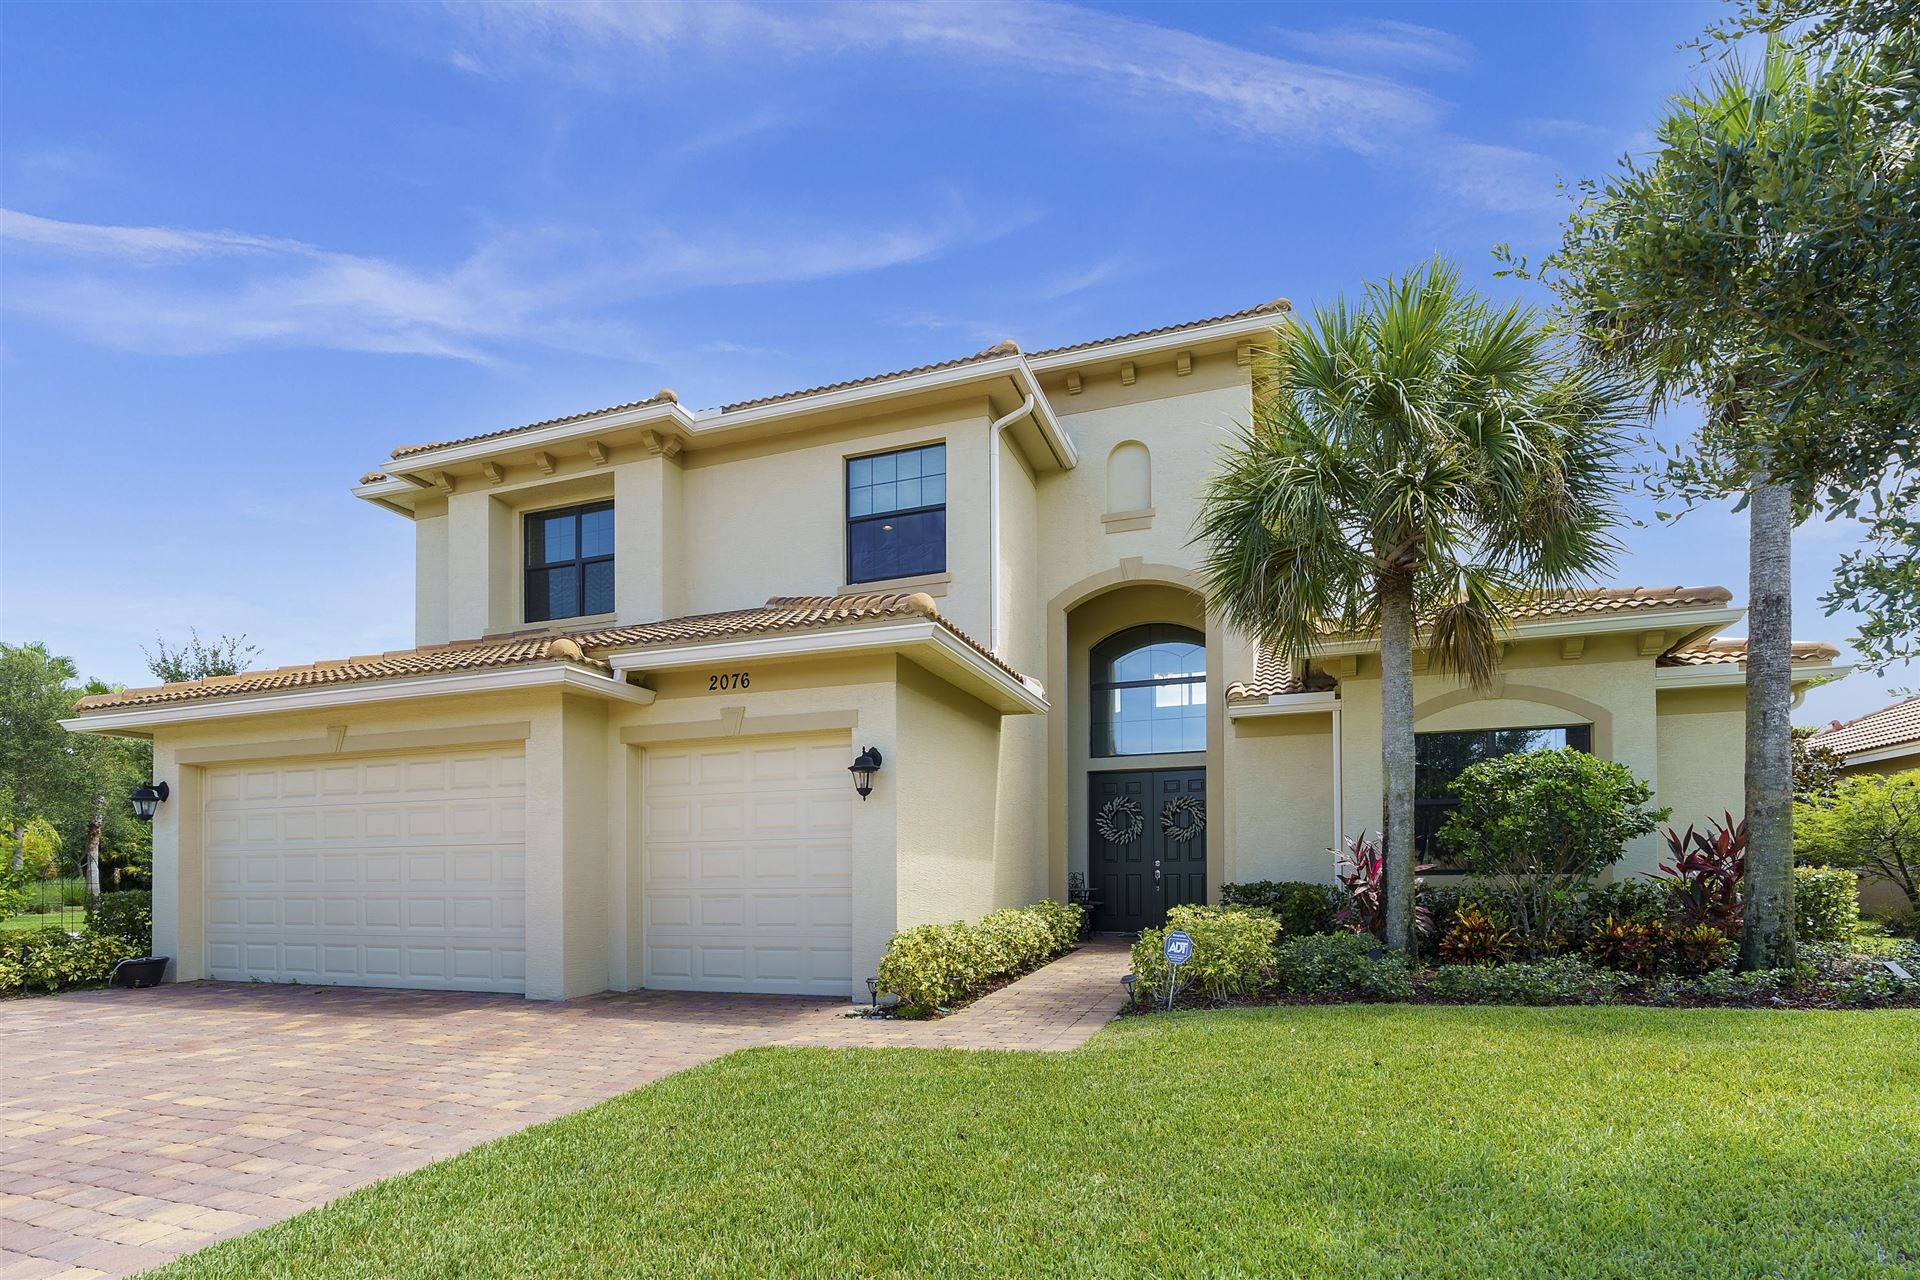 2076 NW Diamond Creek Way, Jensen Beach, FL 34957 - #: RX-10646630